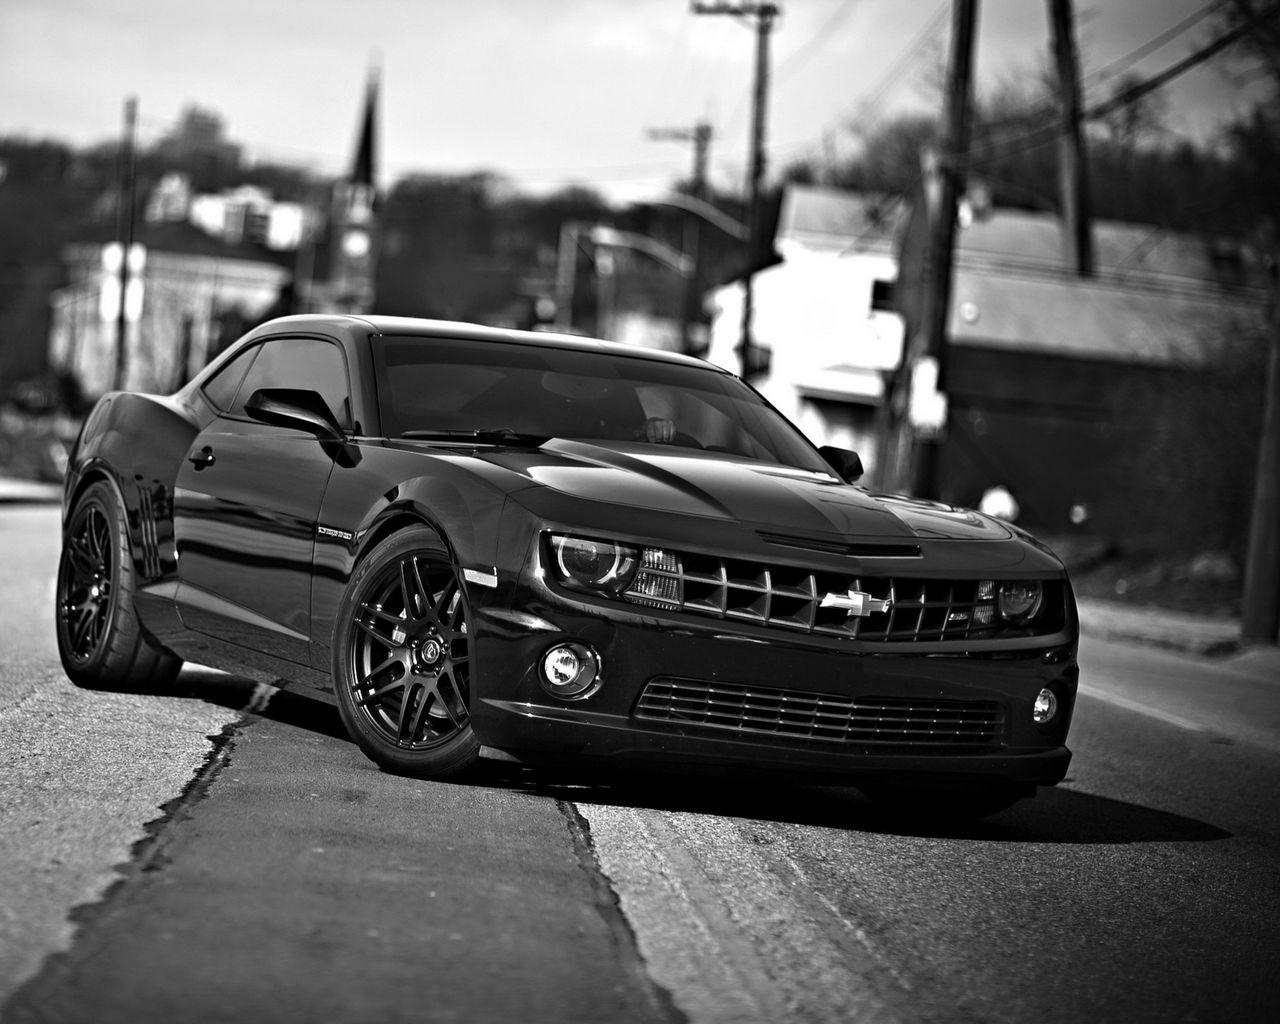 1280x1024 Wallpaper chevrolet camaro, chevrolet, cars, front view, black white